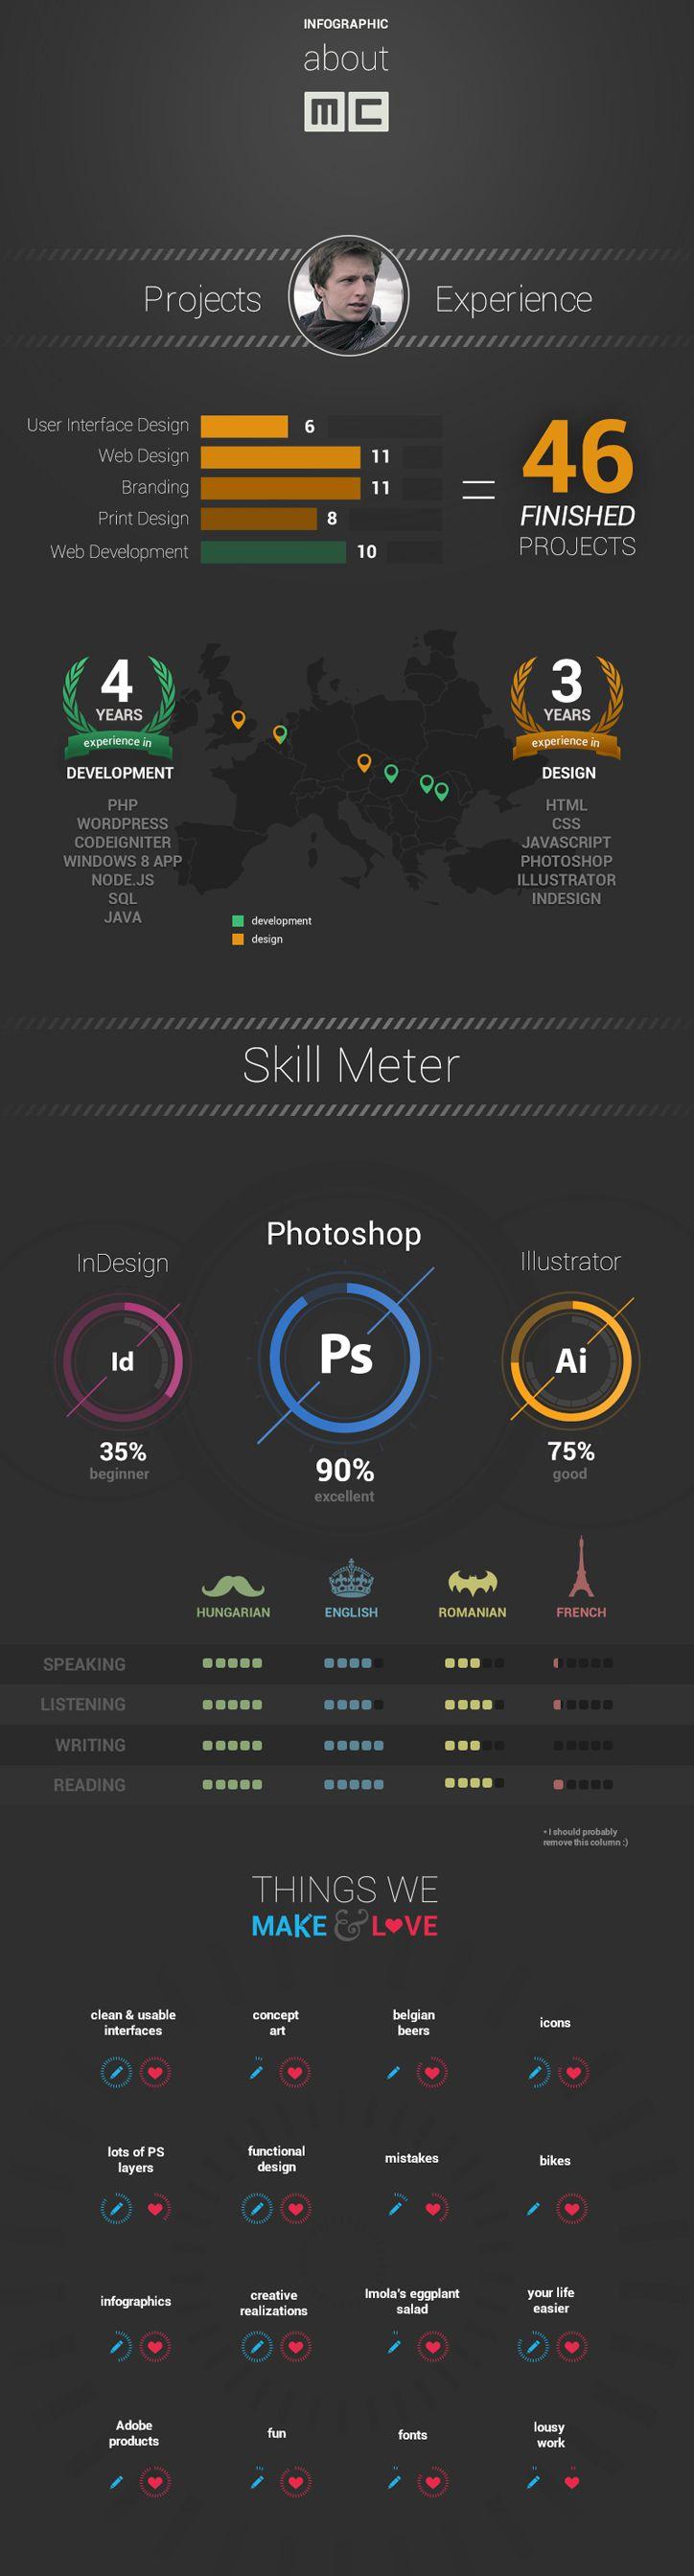 Резюме дизайнера-разработчика.png